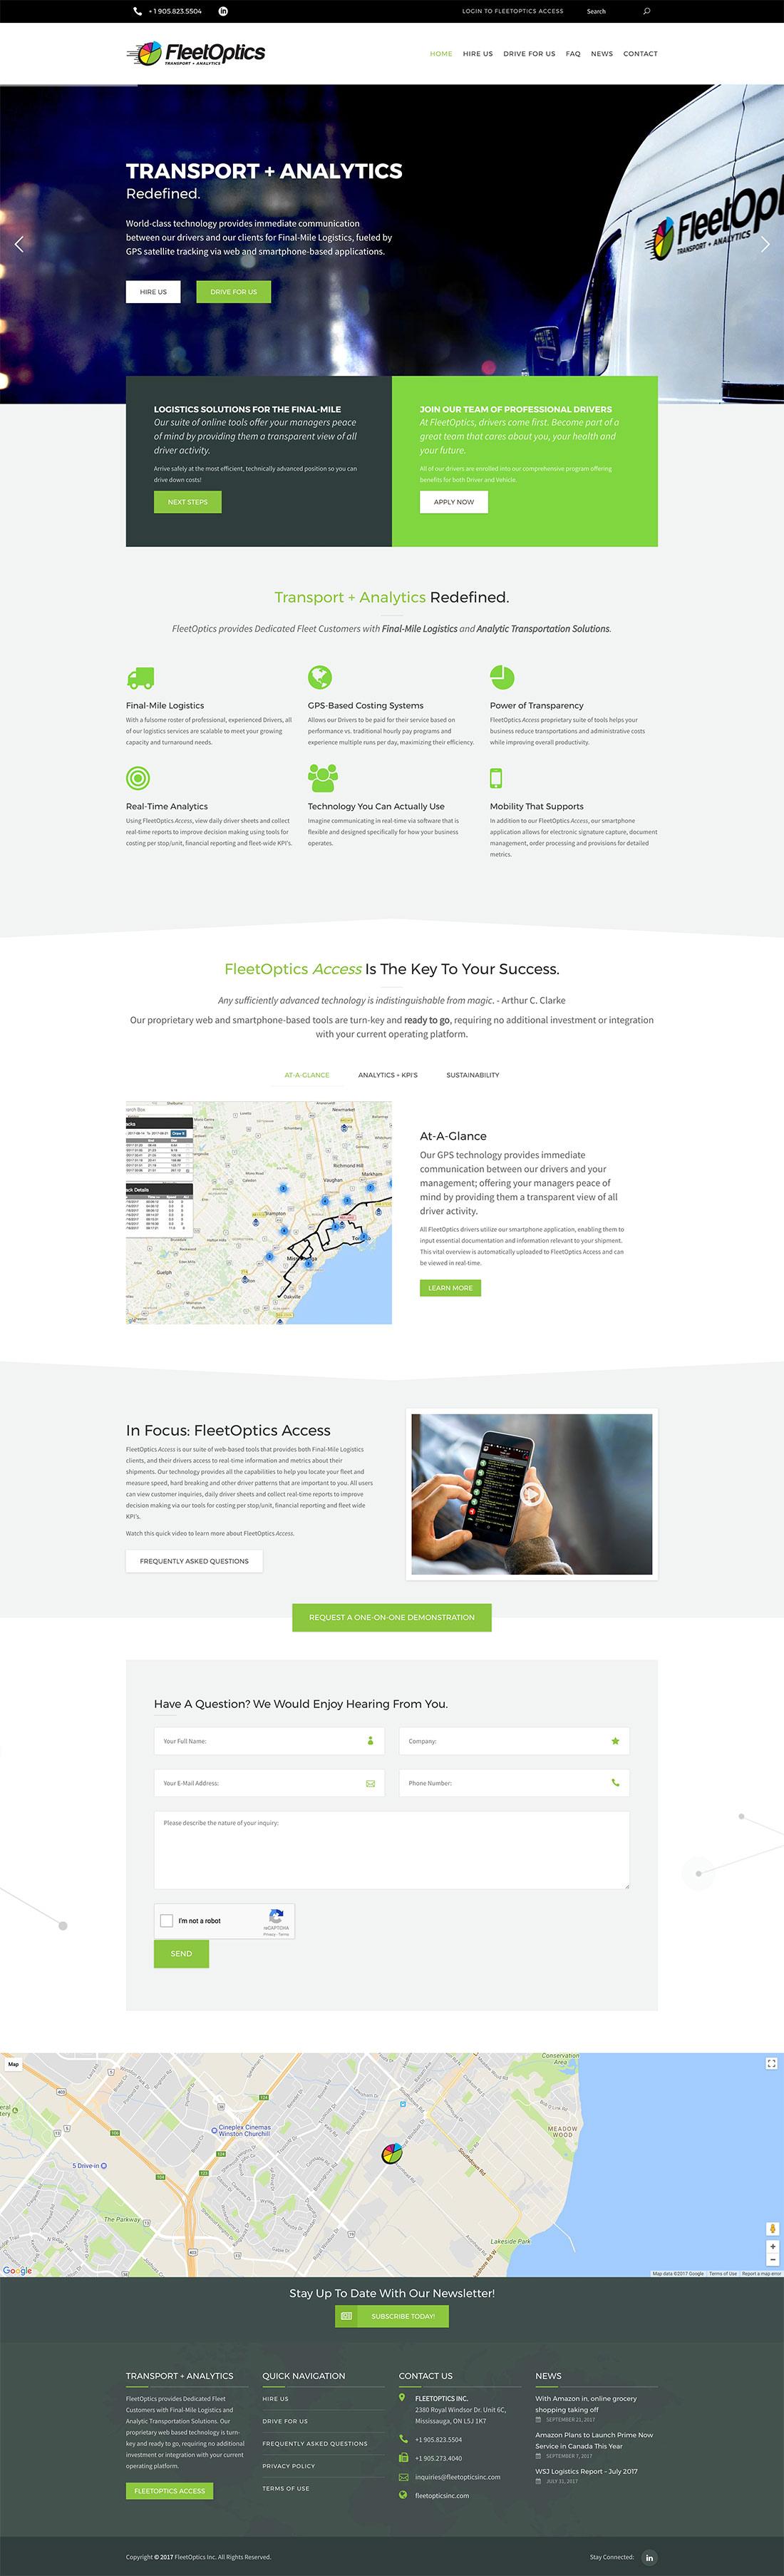 FleetOptics Inc. Web Site